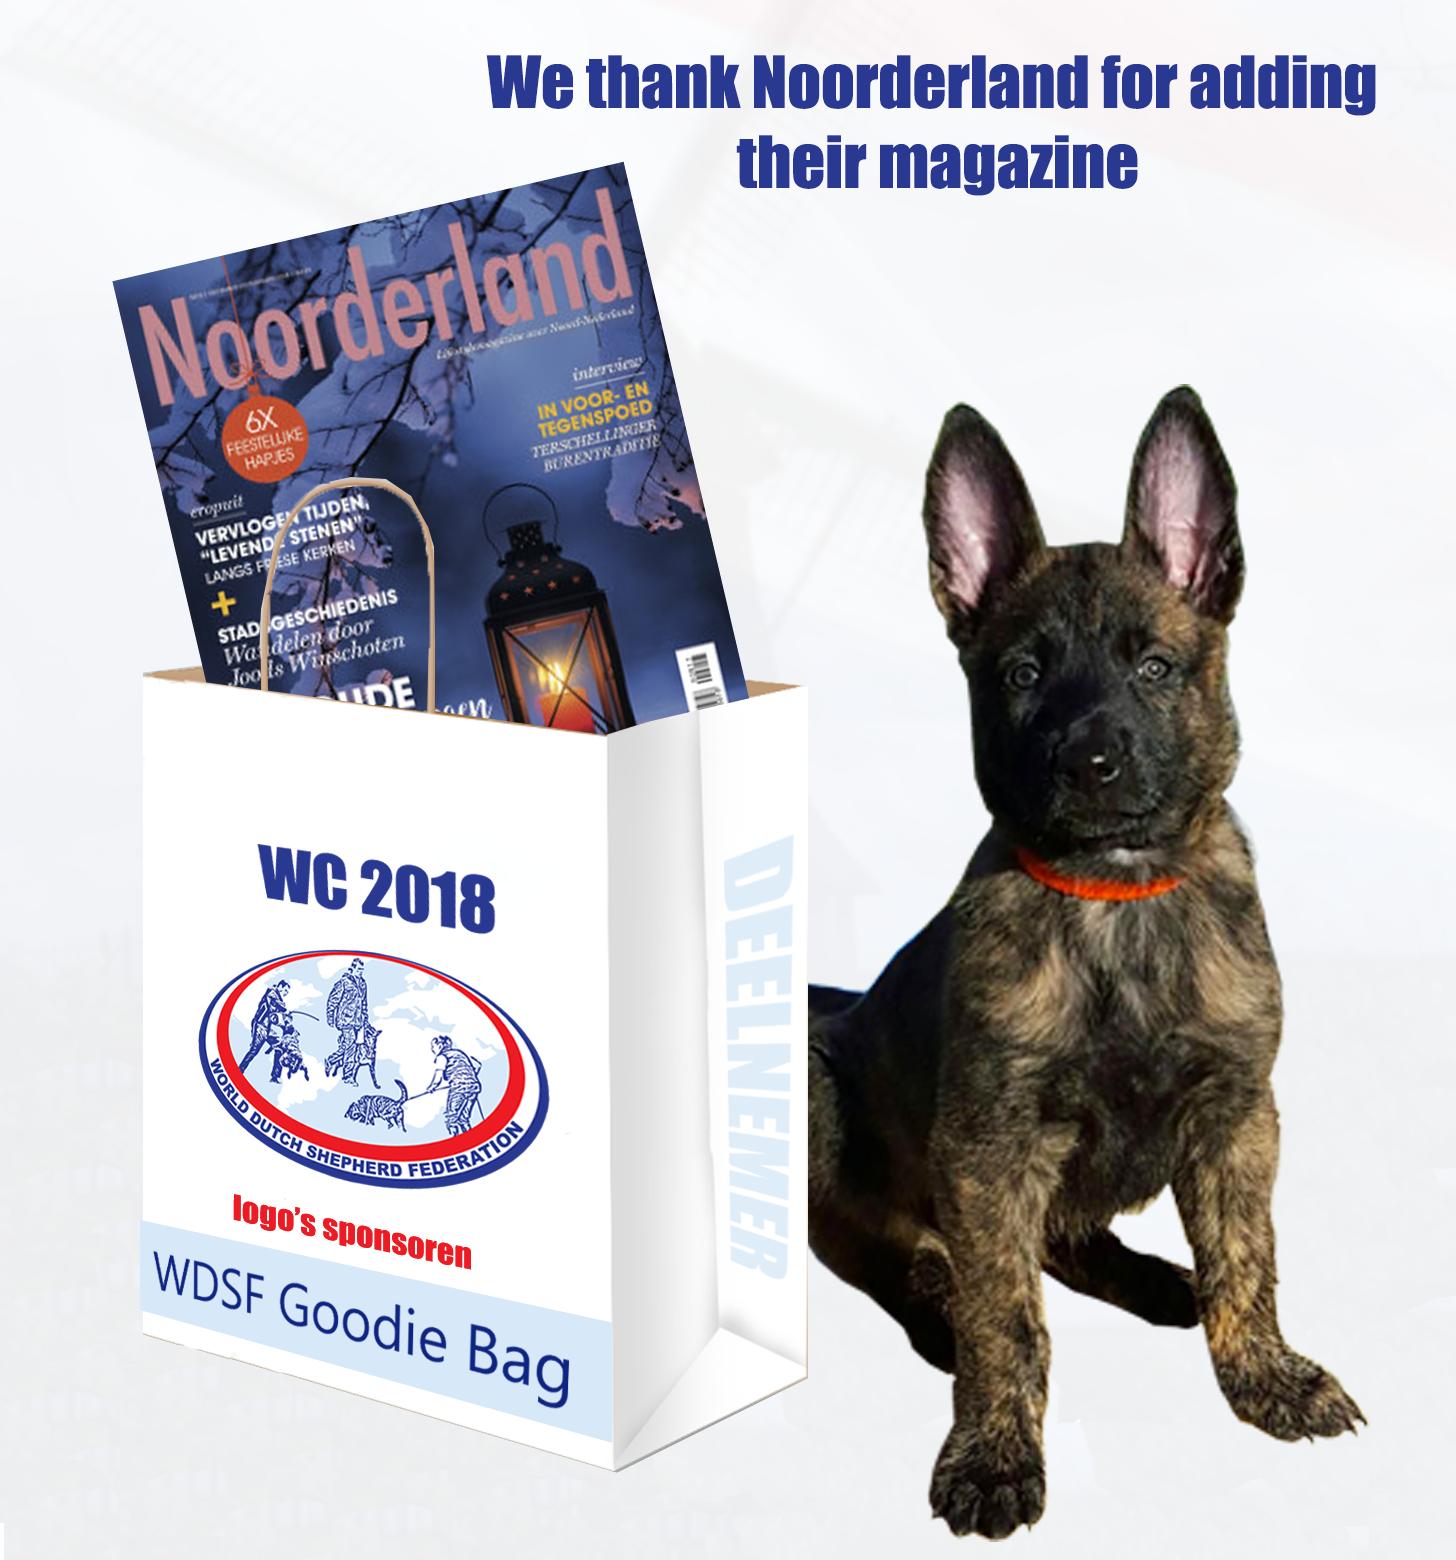 goodie bag noorderland thank you